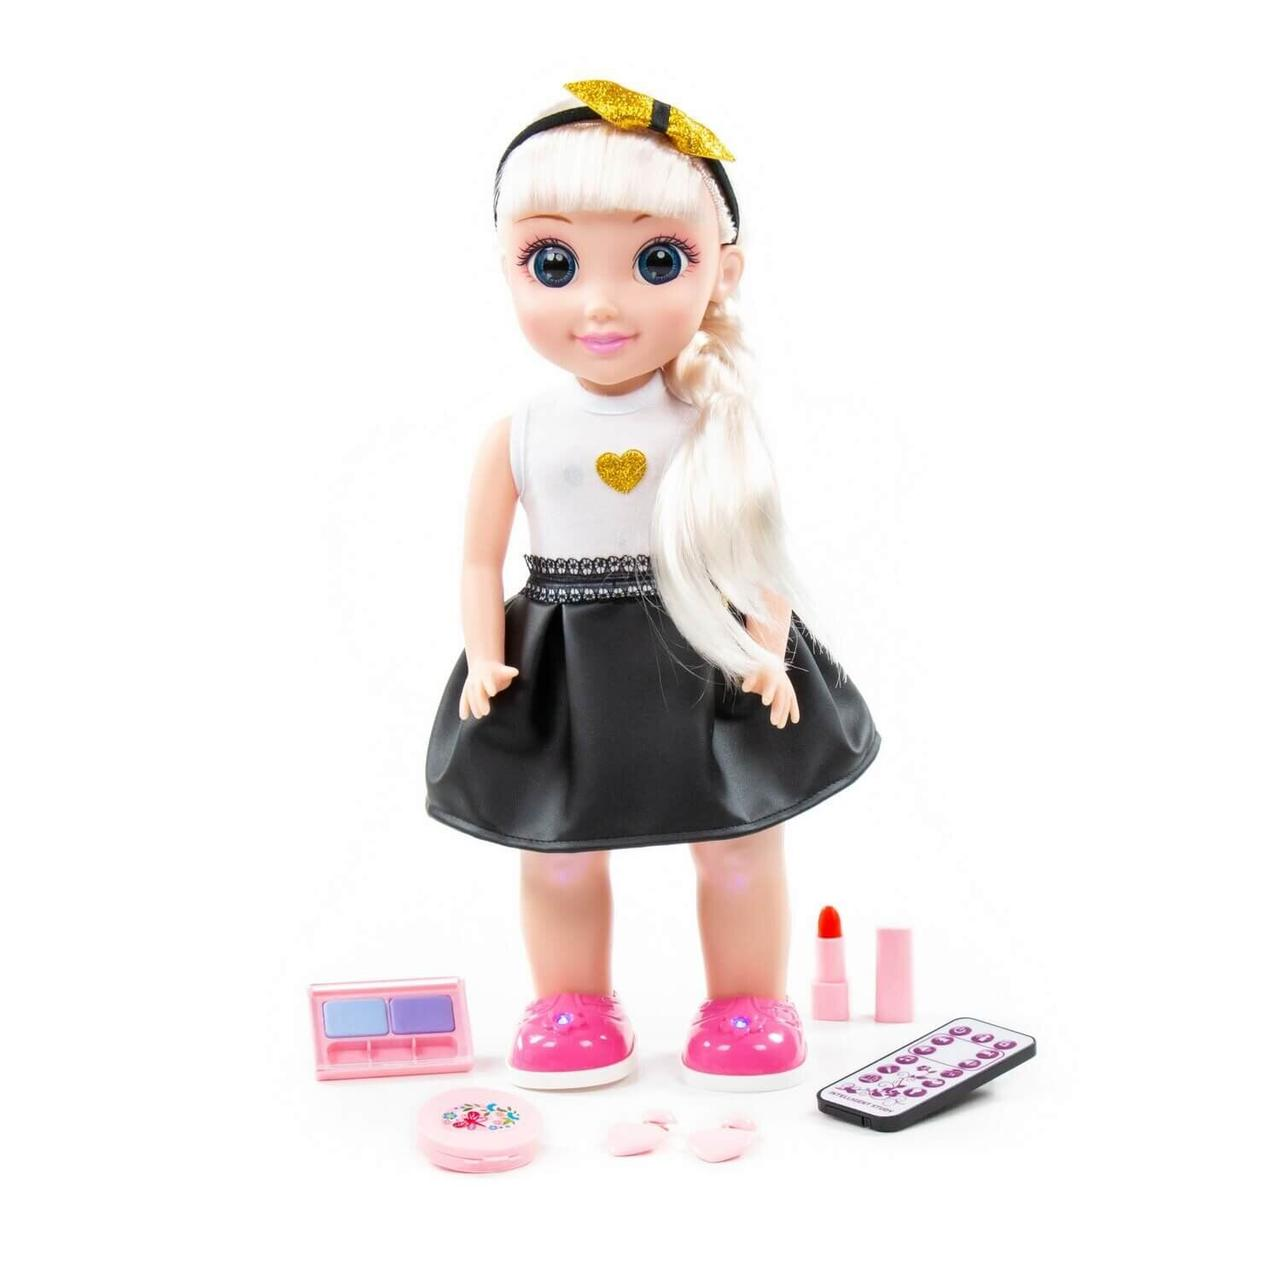 "Кукла ""Кристина"" (37 см) в салоне красоты с аксессуарами (5 элементов в коробке), Polesie (79336)"